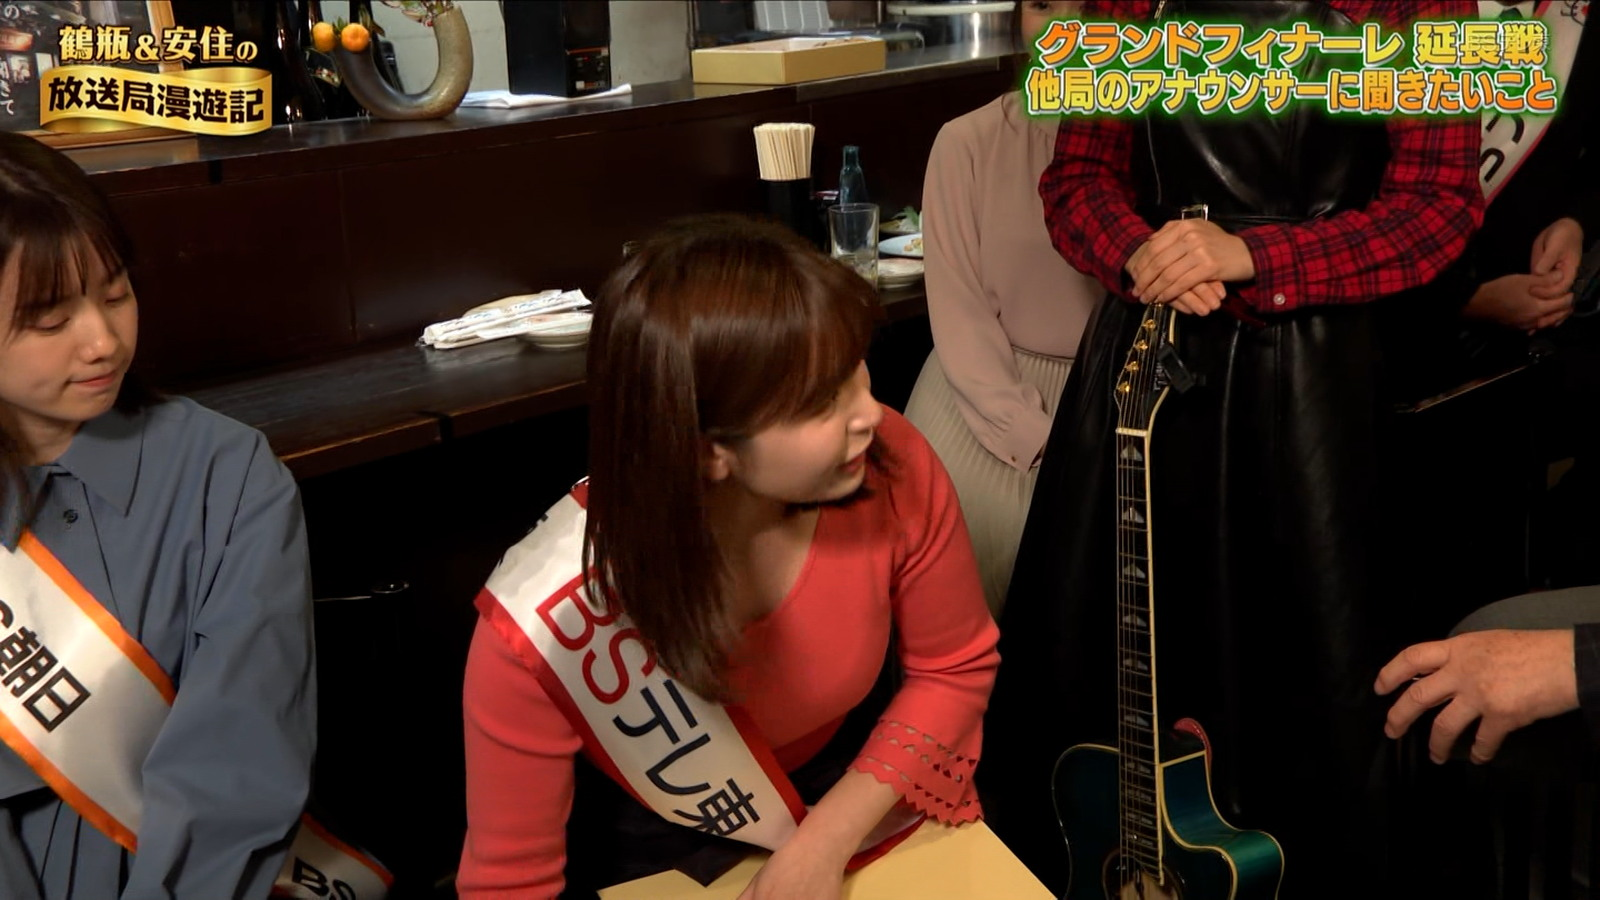 角谷暁子_女子アナ_着衣巨乳_鶴瓶&安住の放送局漫遊記_29